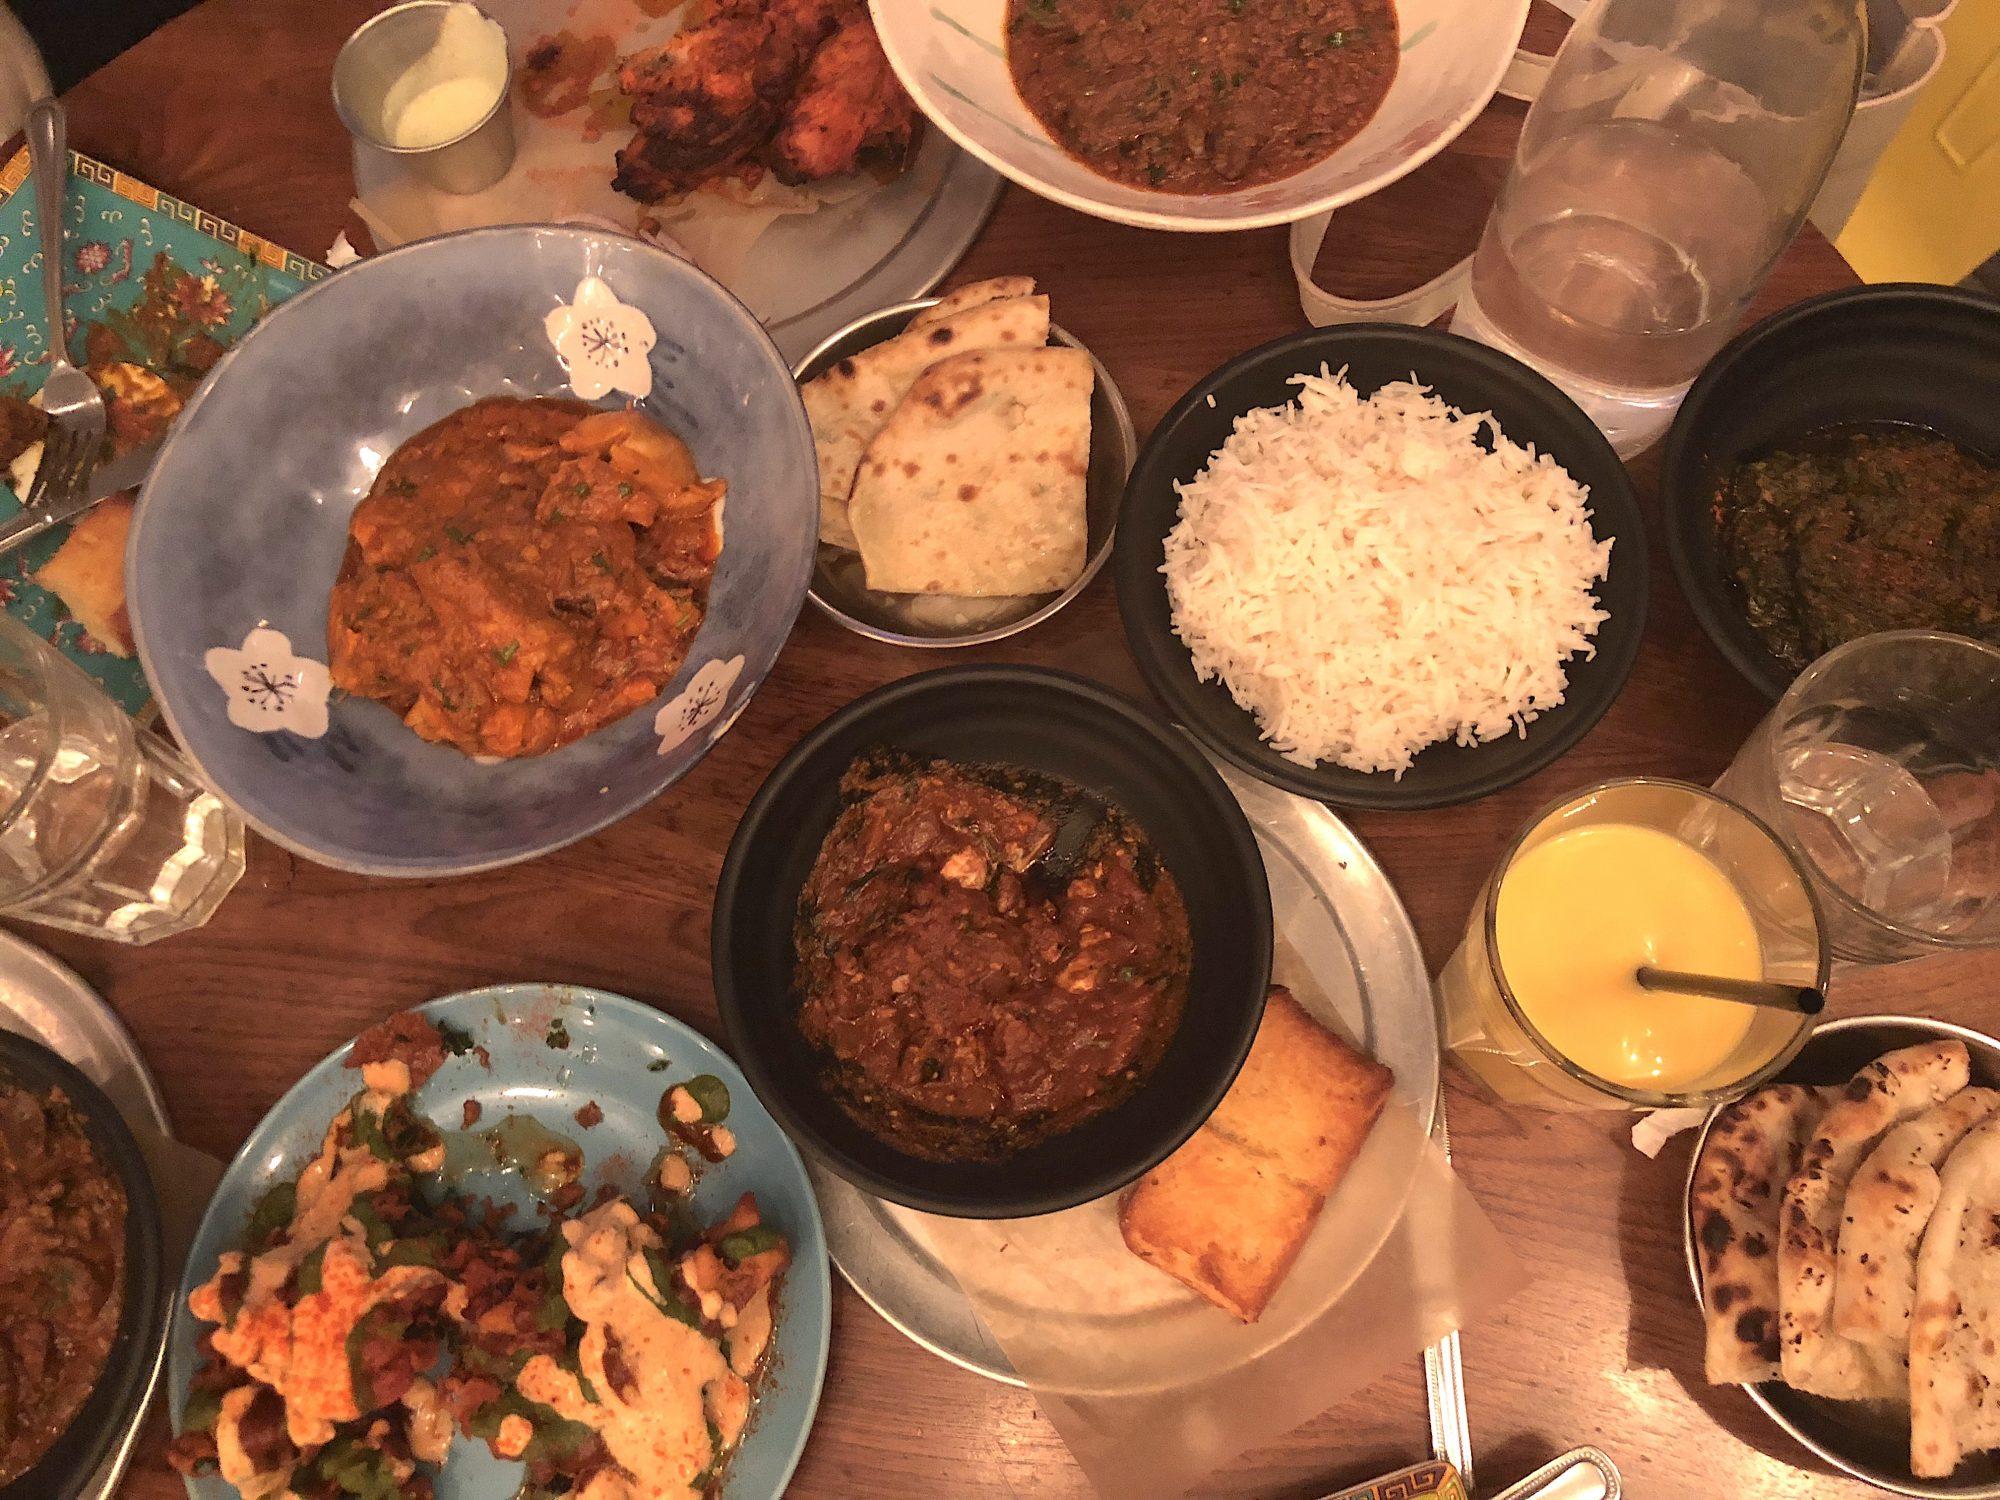 Dinner at Adda Indian Canteen